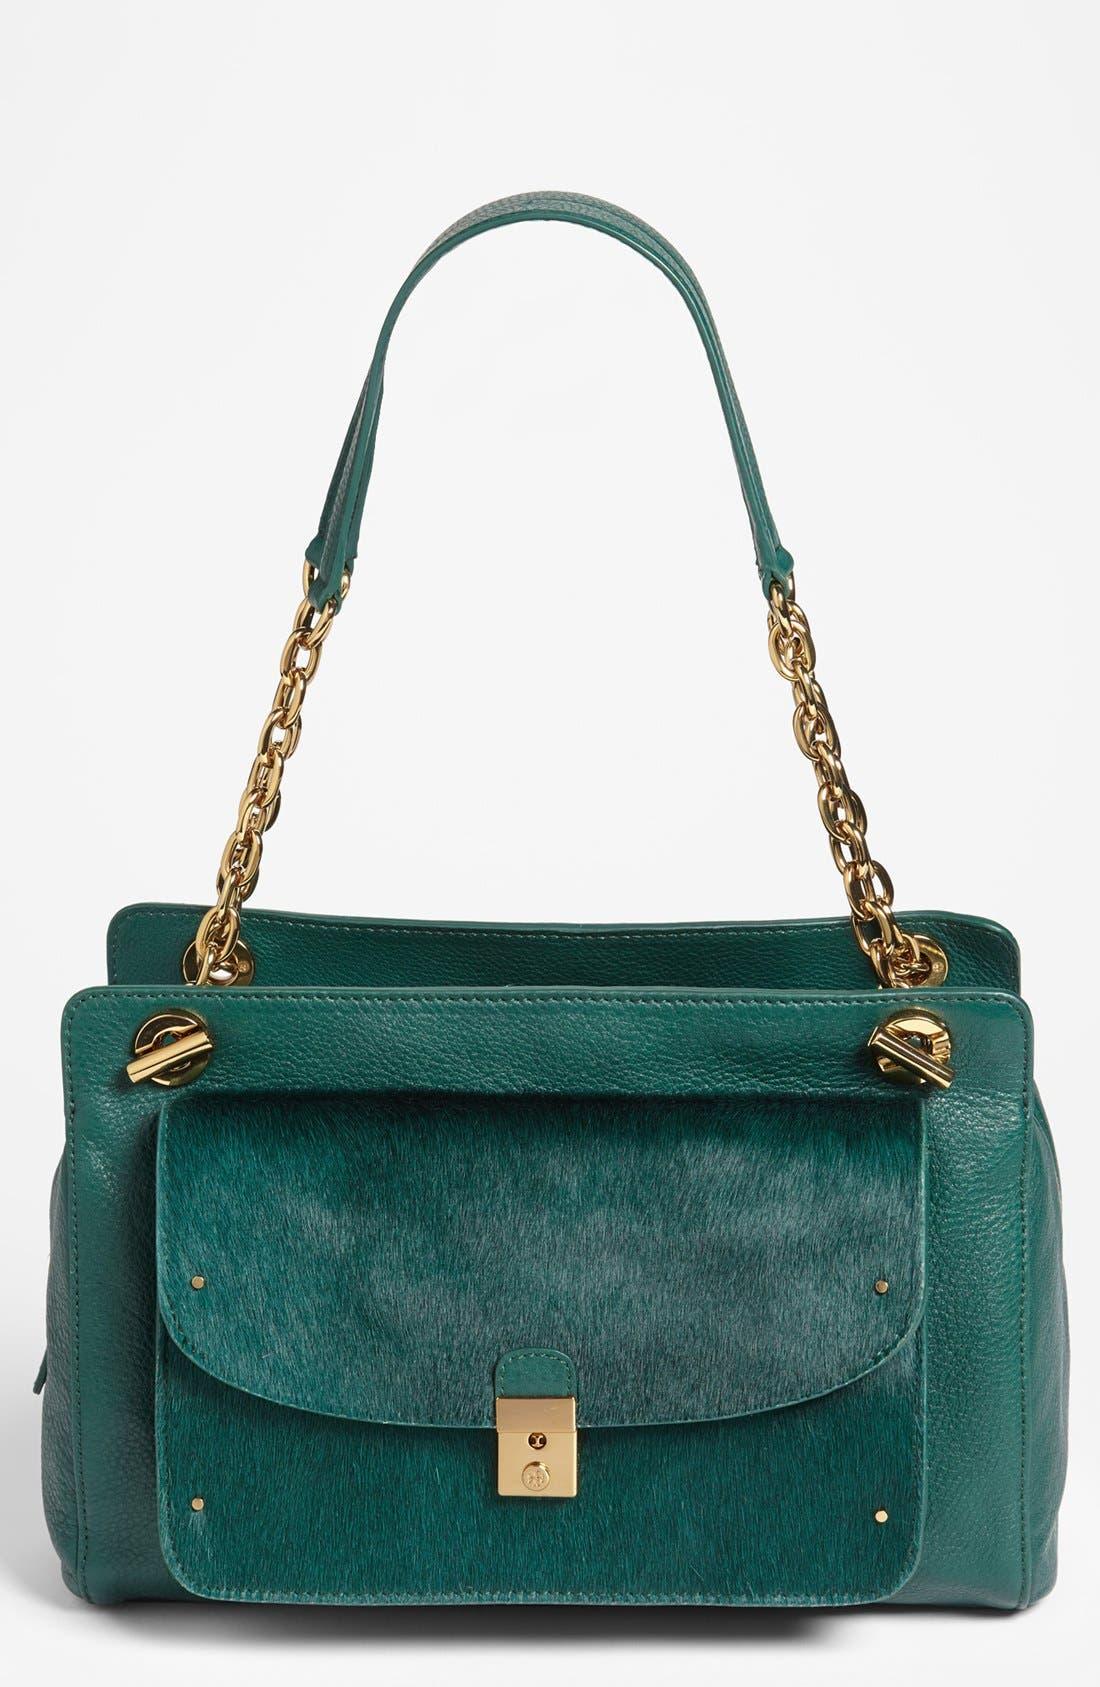 Main Image - Tory Burch 'Priscilla' Leather & Calf Hair Shoulder Bag